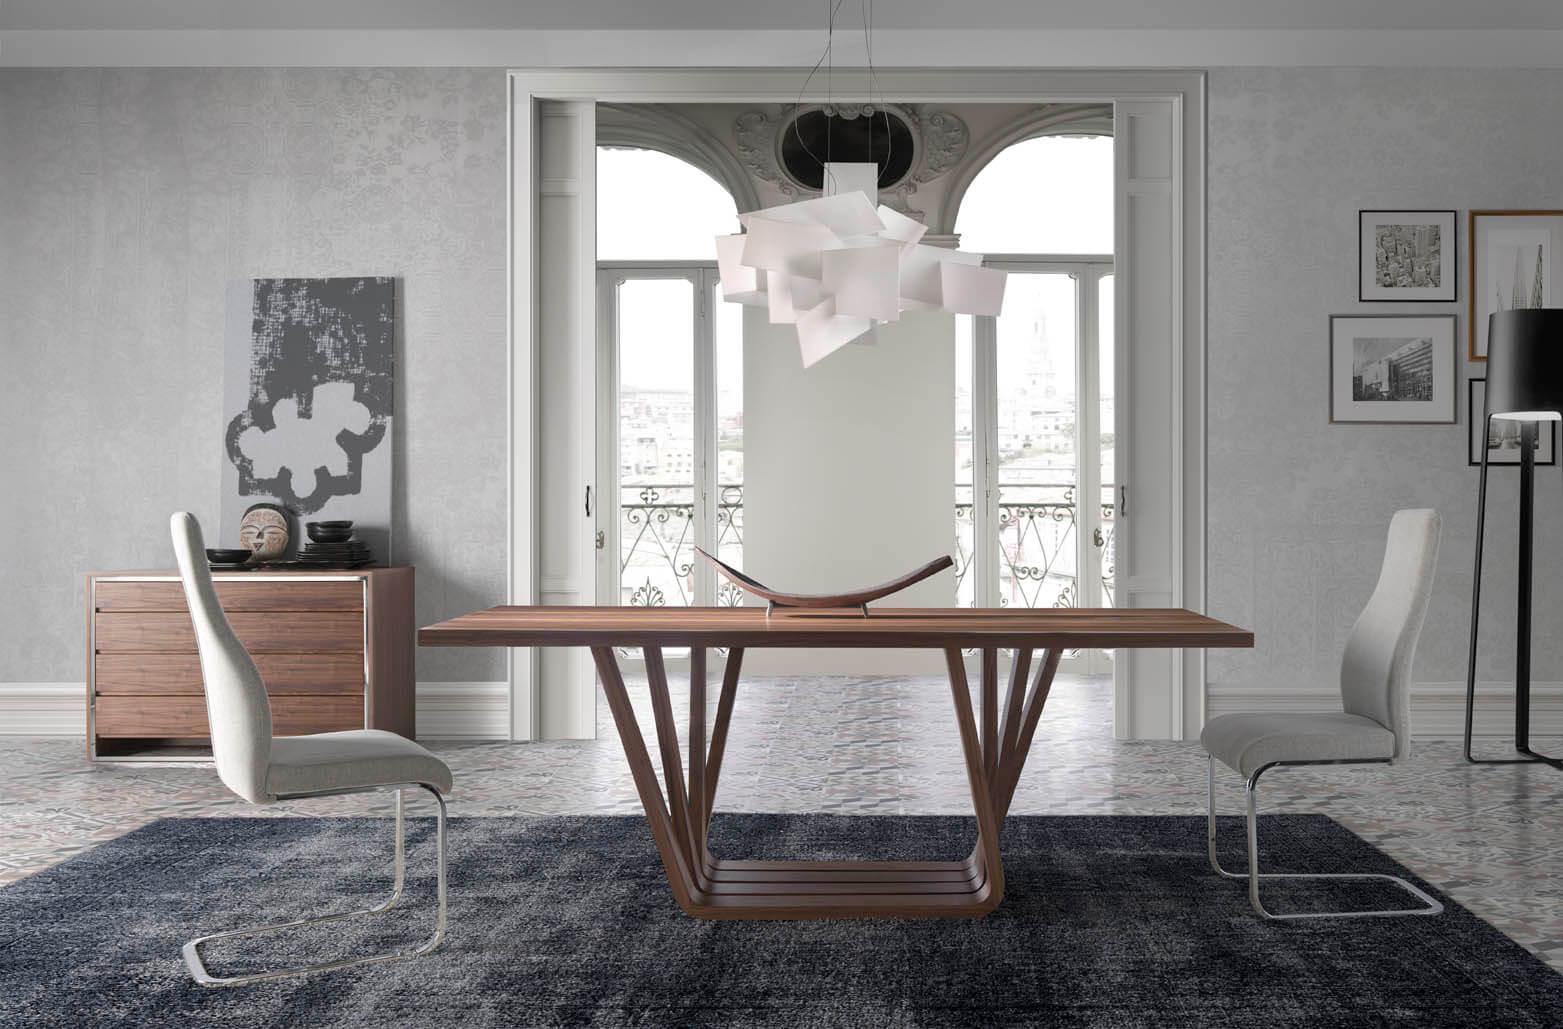 Muebles de vanguardia mobiliario de dise o italiano for Muebles angel cerda